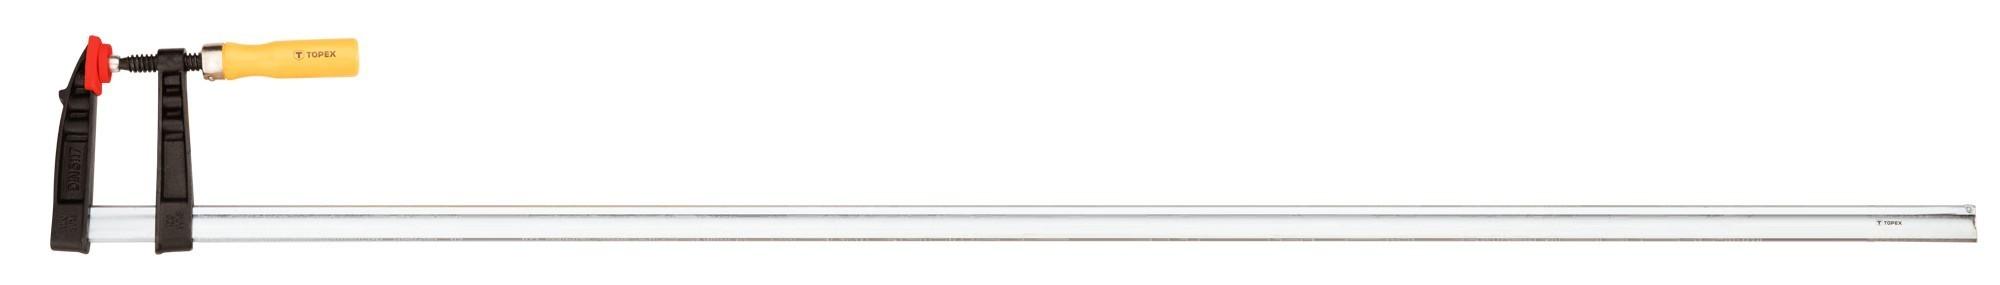 Szorító 120 mm x 1500 mm | TOPEX 12A135